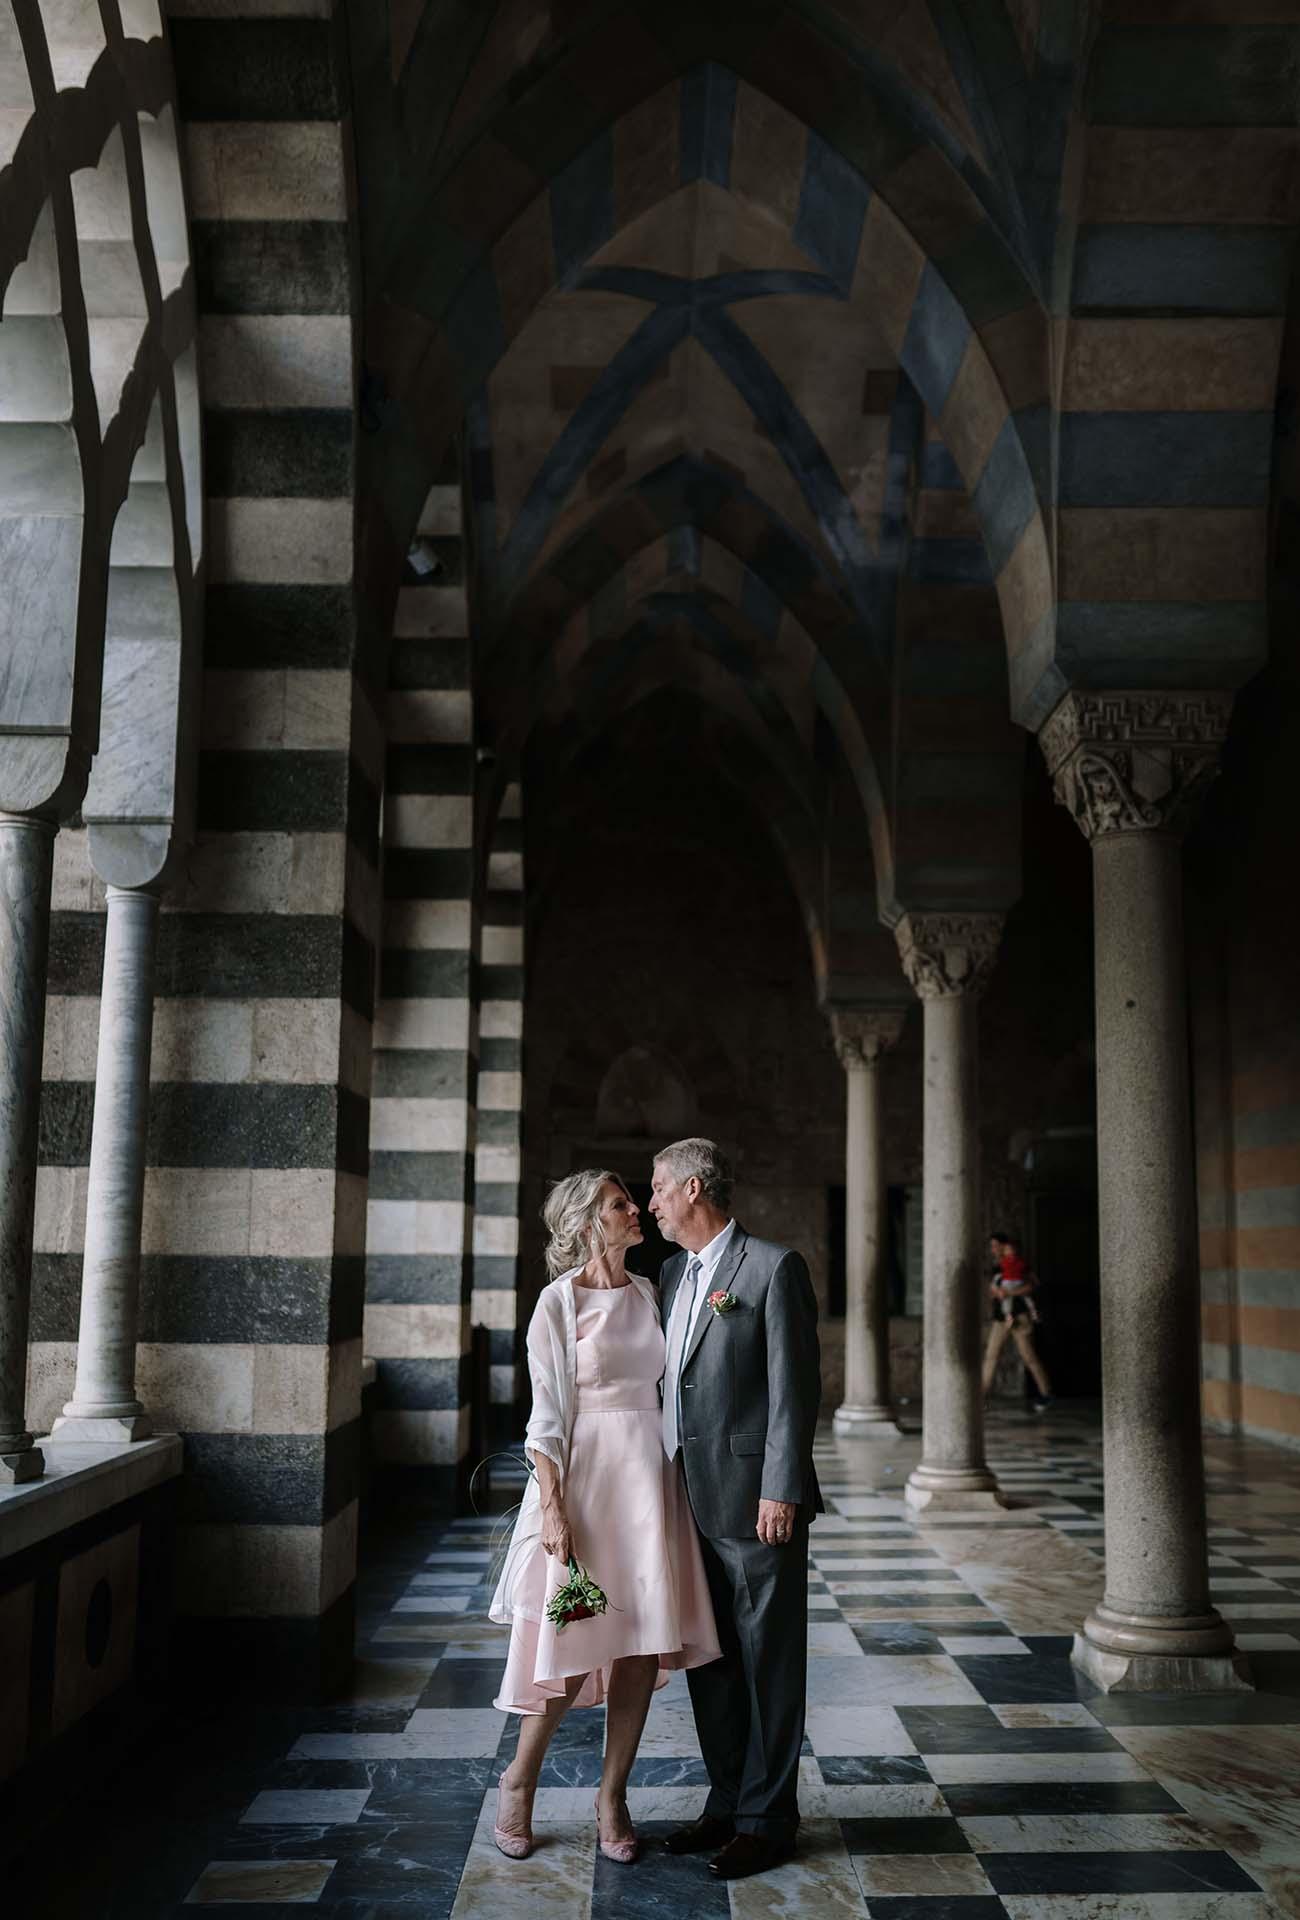 matrimonio costiera amalfitana (3)